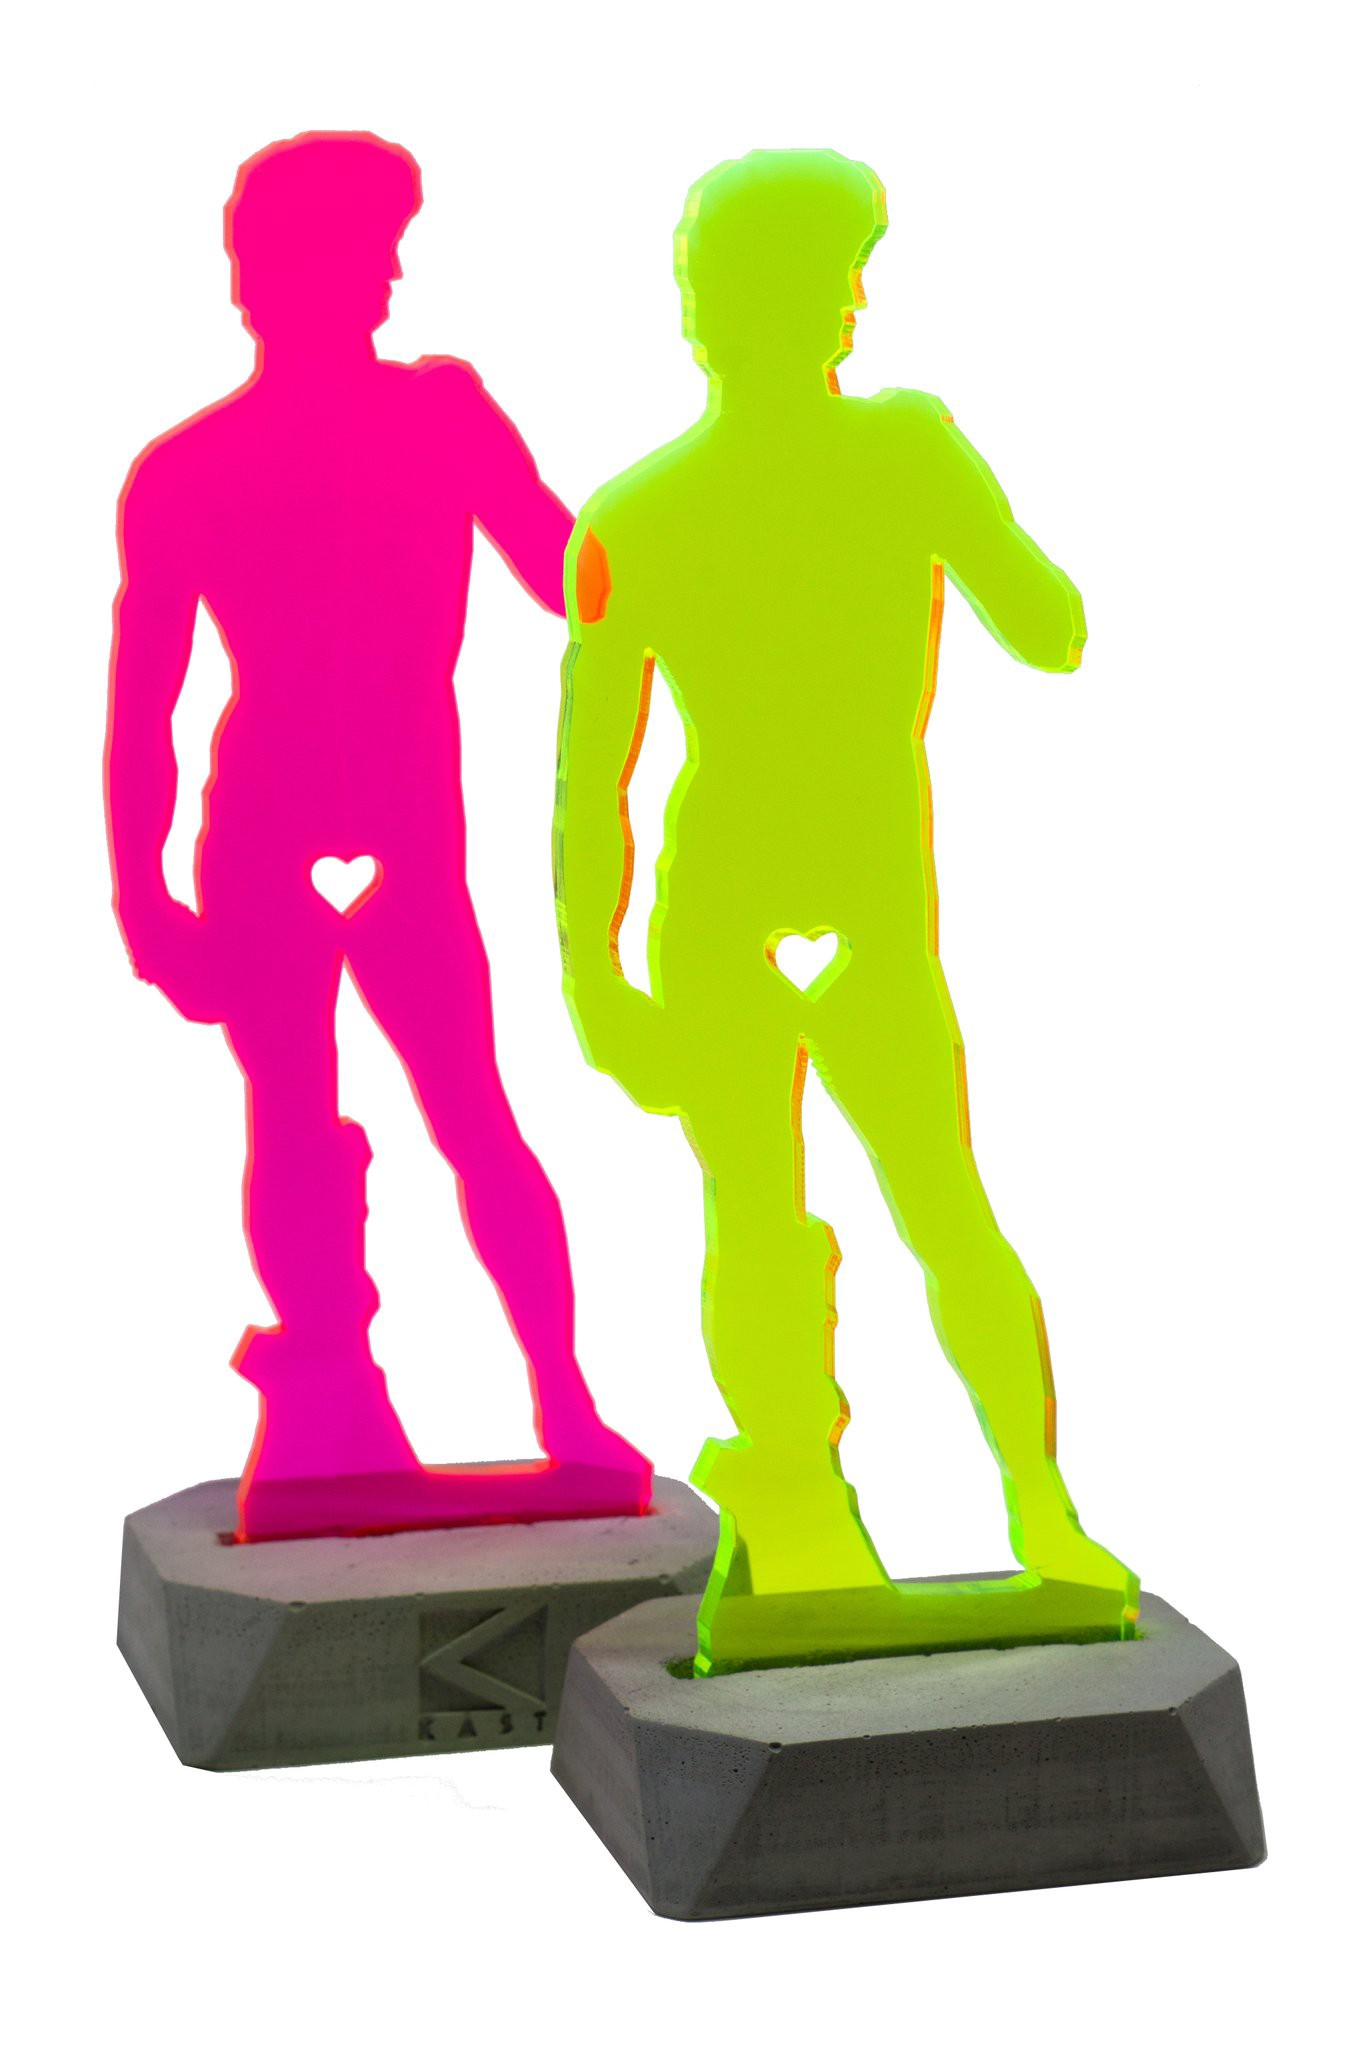 Michaelgelo's statue of David in acrylic